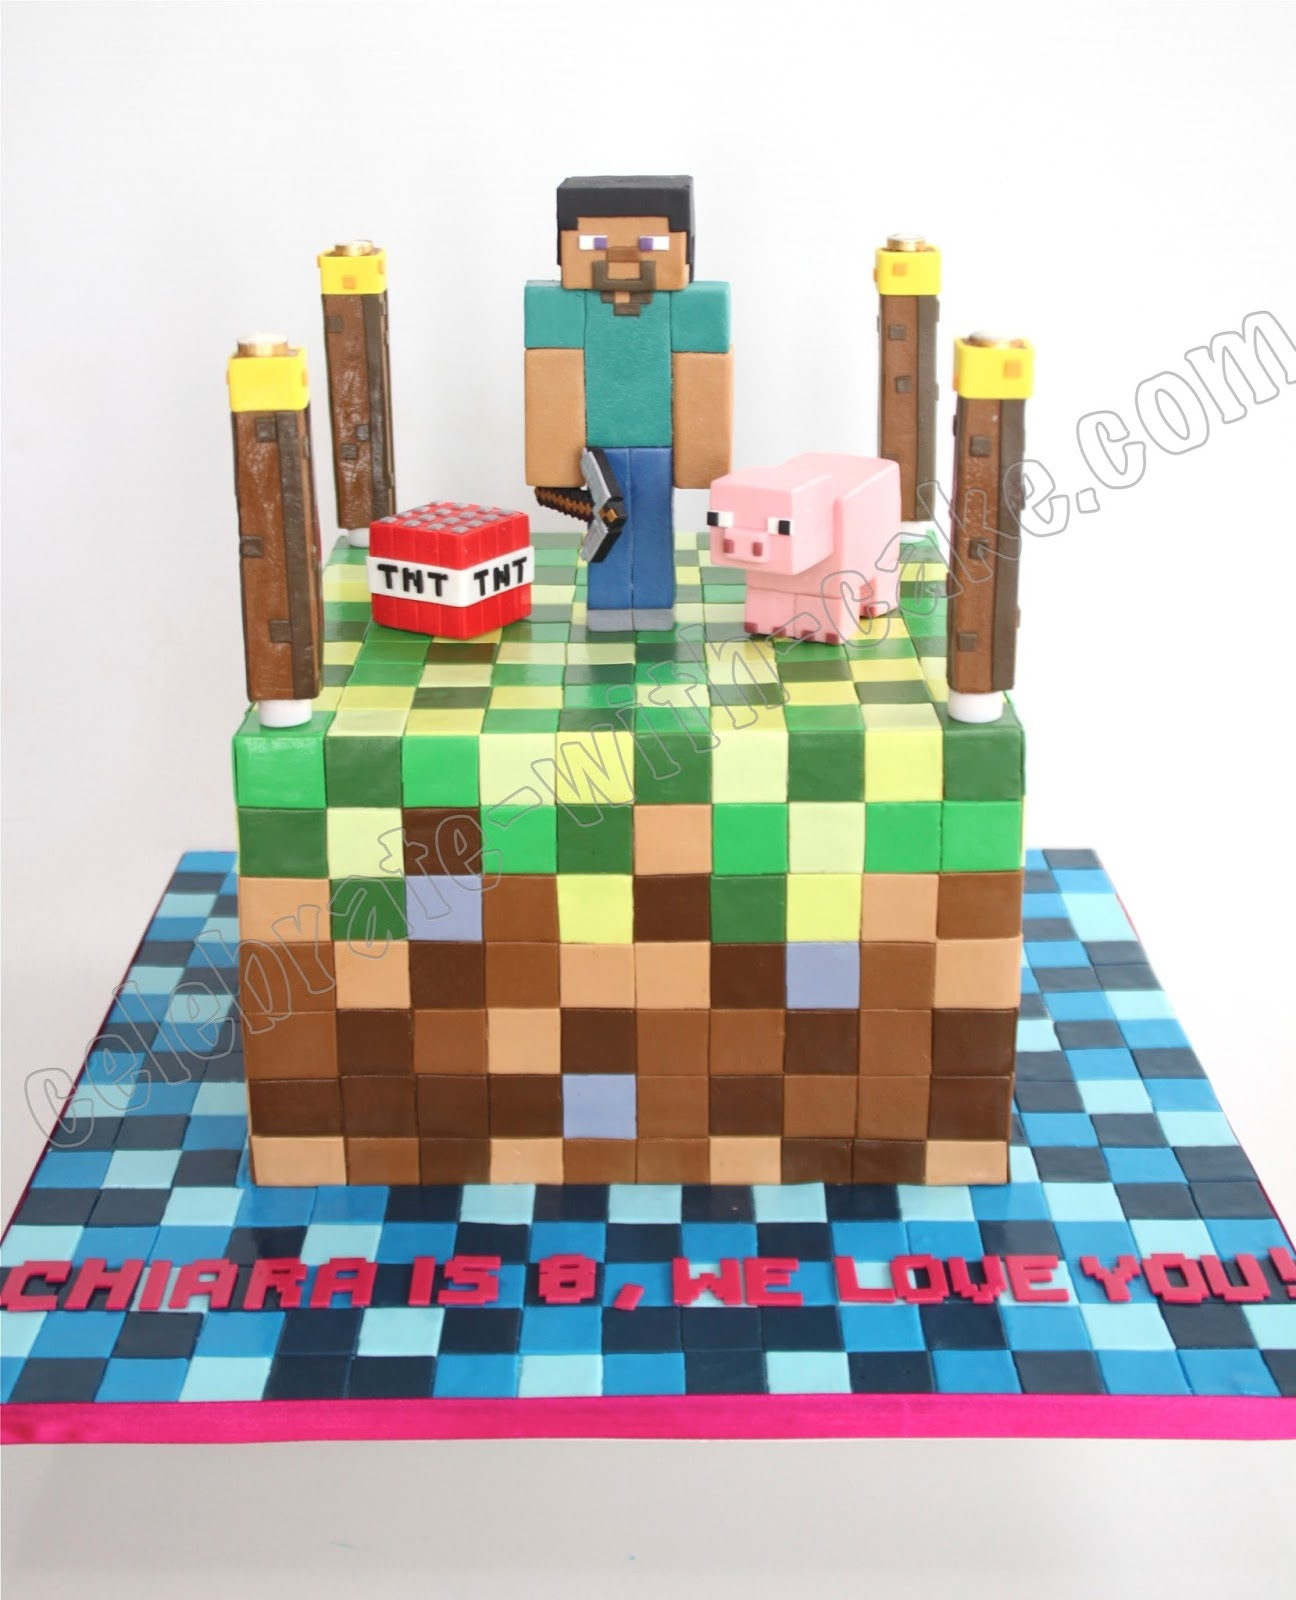 Celebrate with Cake Minecraft Cake